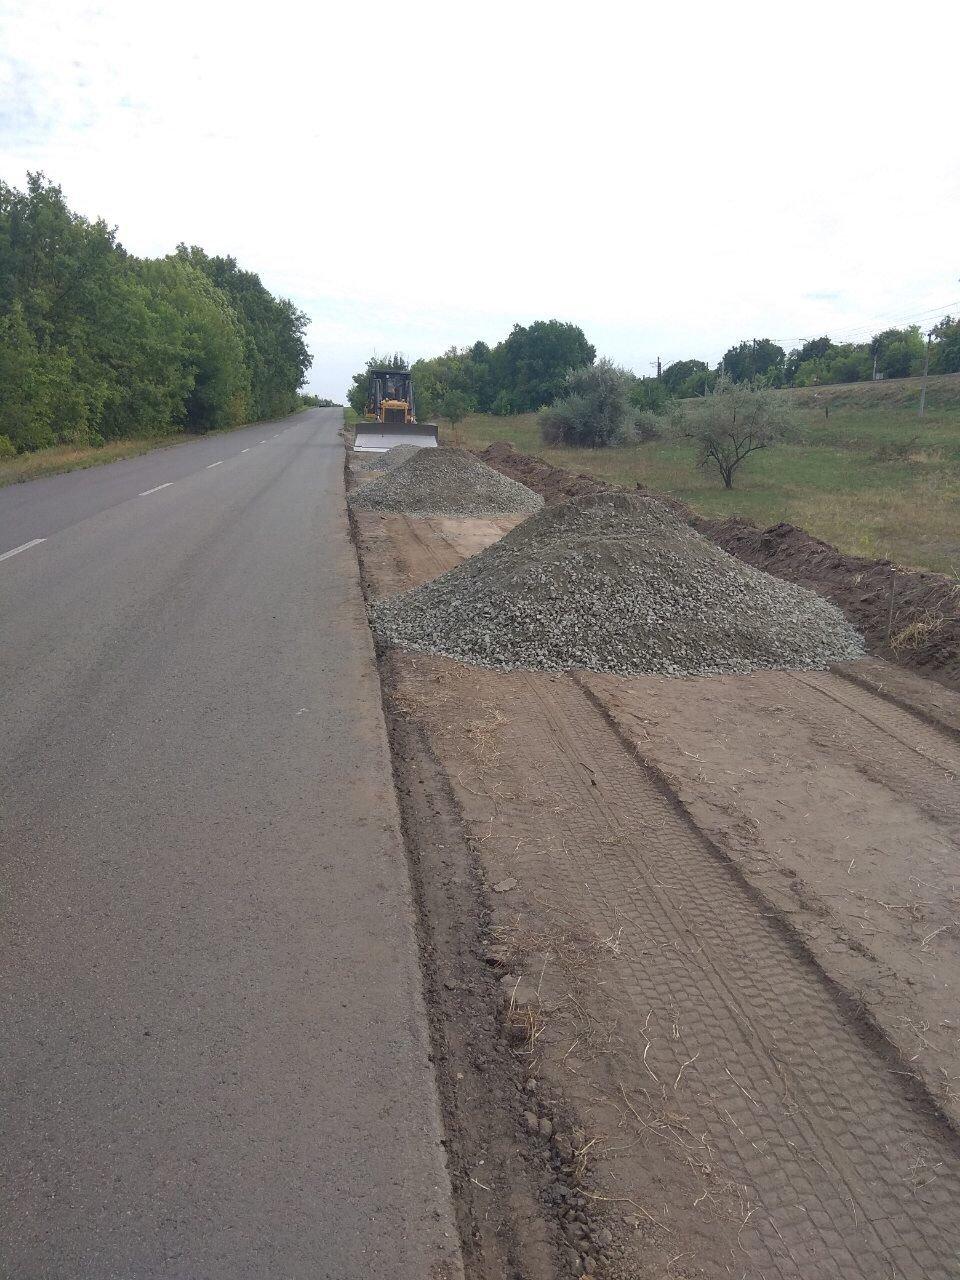 На трассе Мерефа-Лозовая-Павлоград, возле села Тарановка, обустраивают весовой комплекс, фото-4